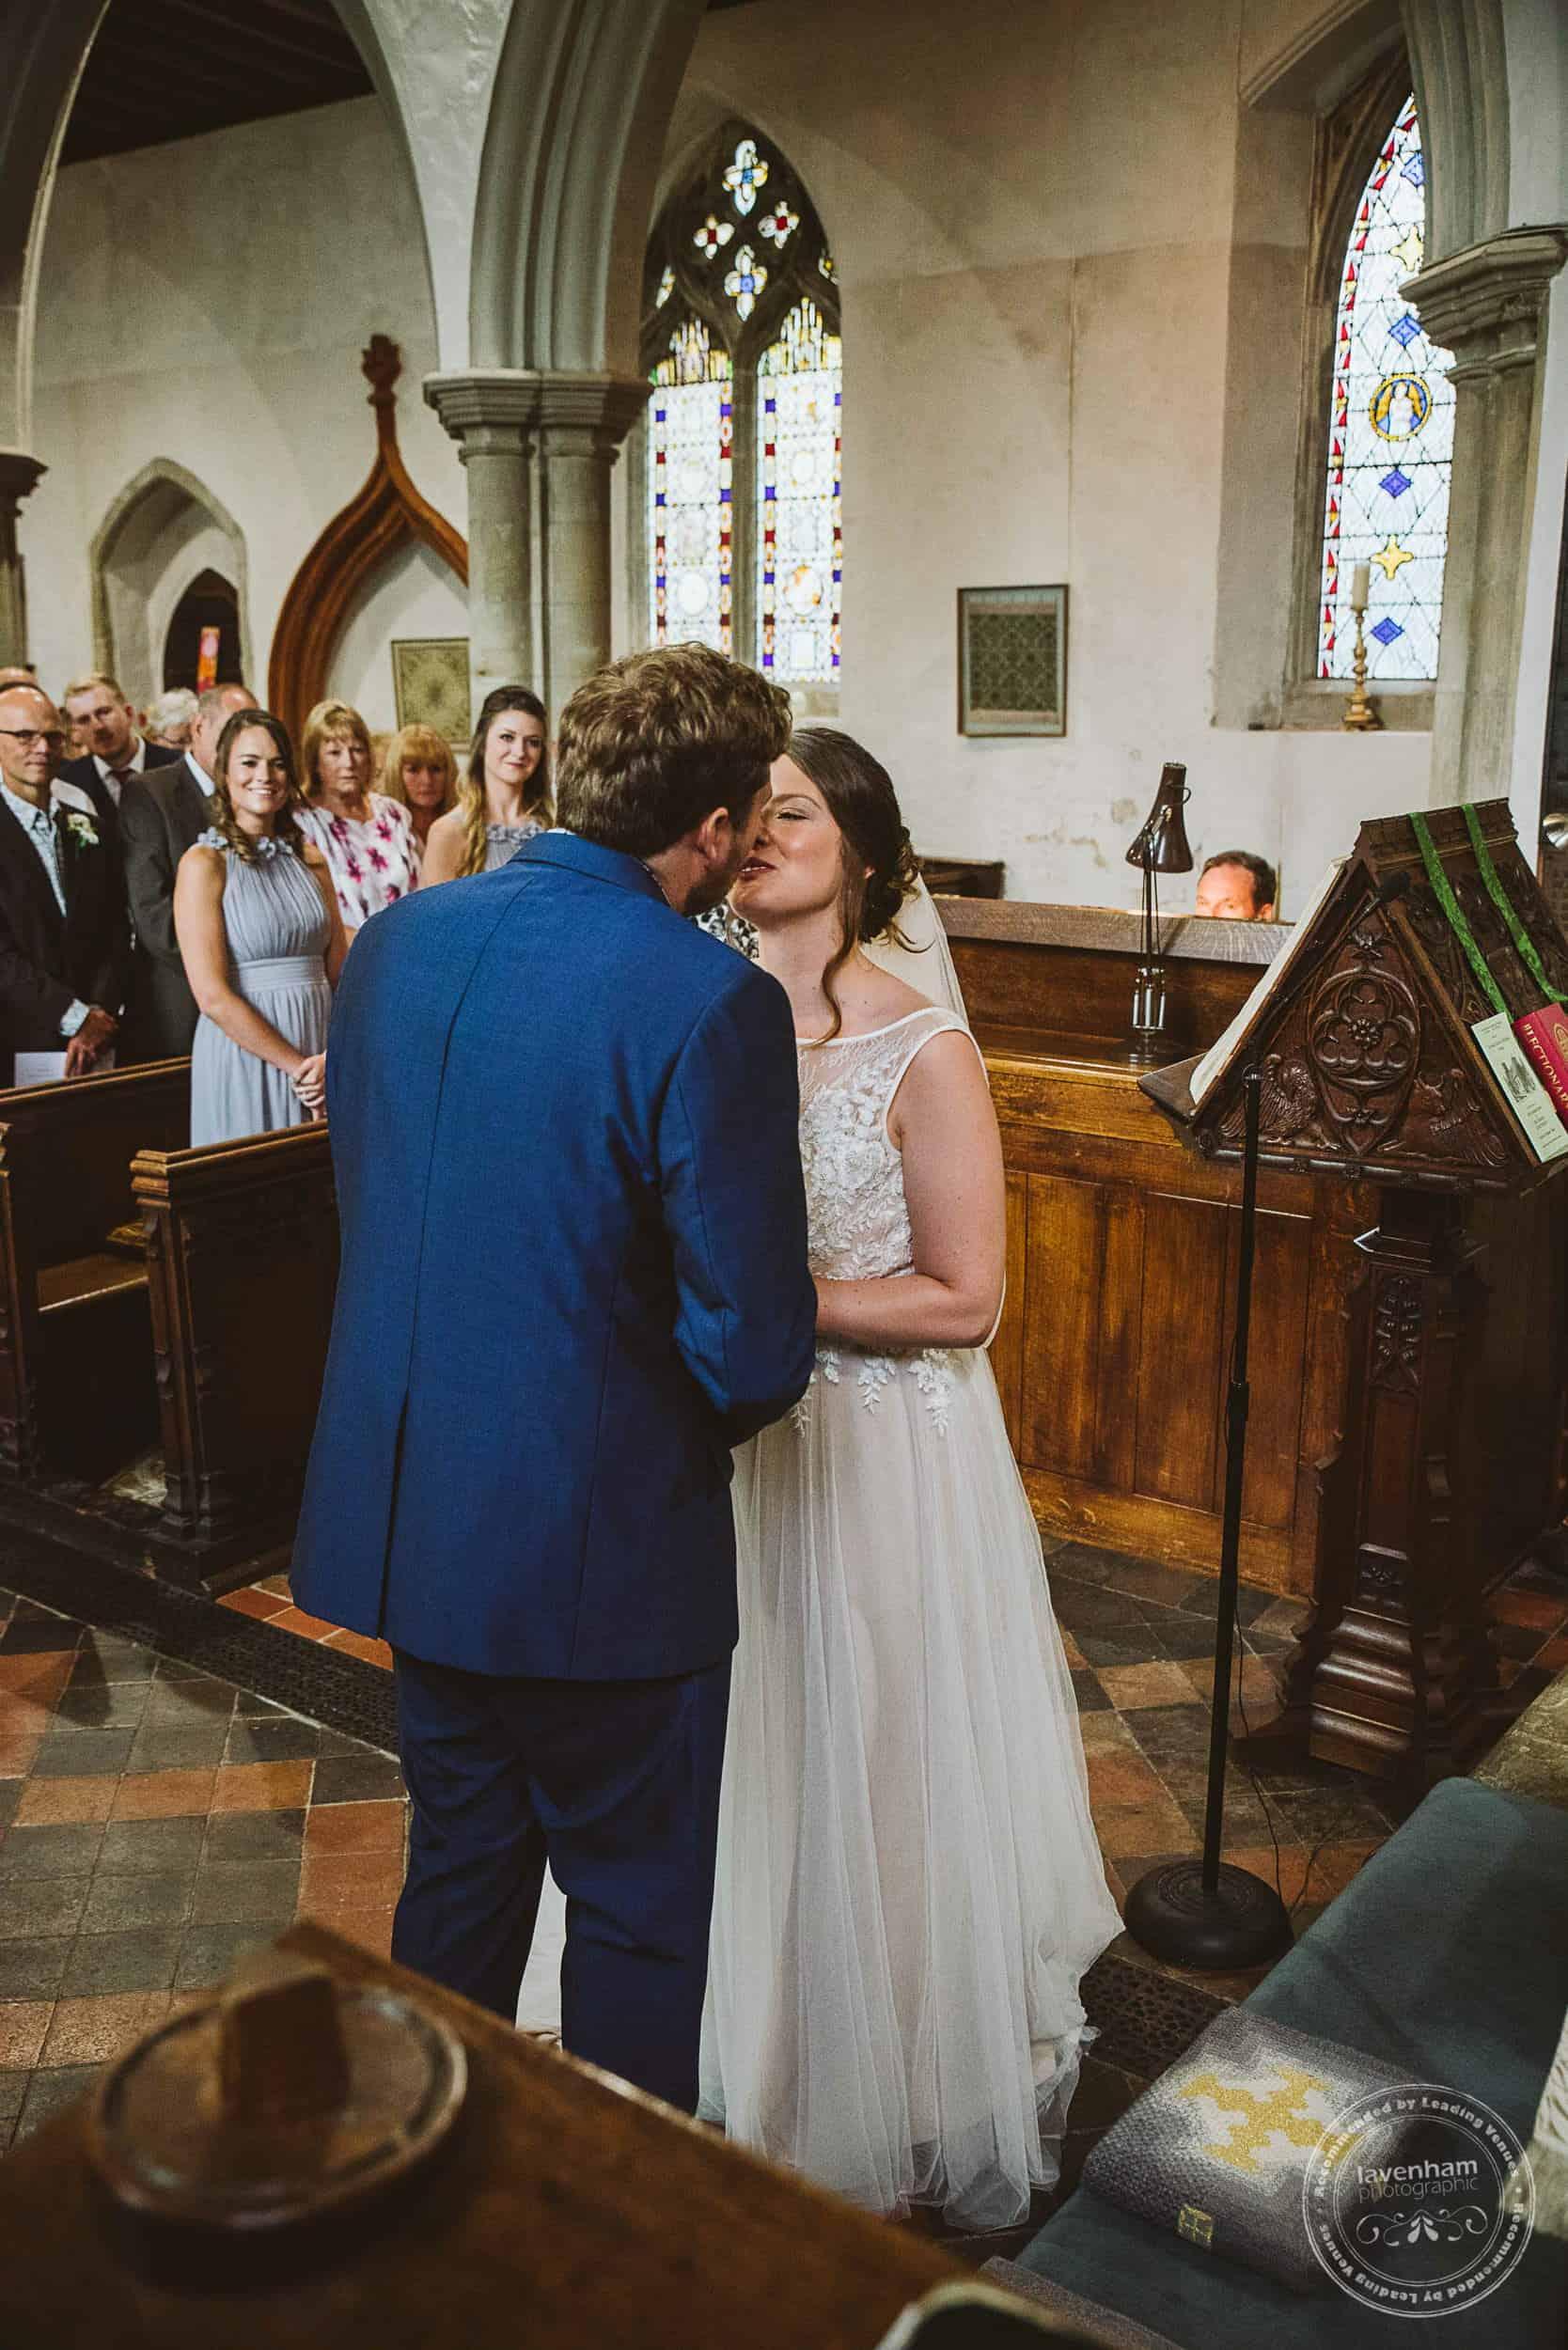 180818 Marks Hall Wedding Photography Lavenham Photographic 056